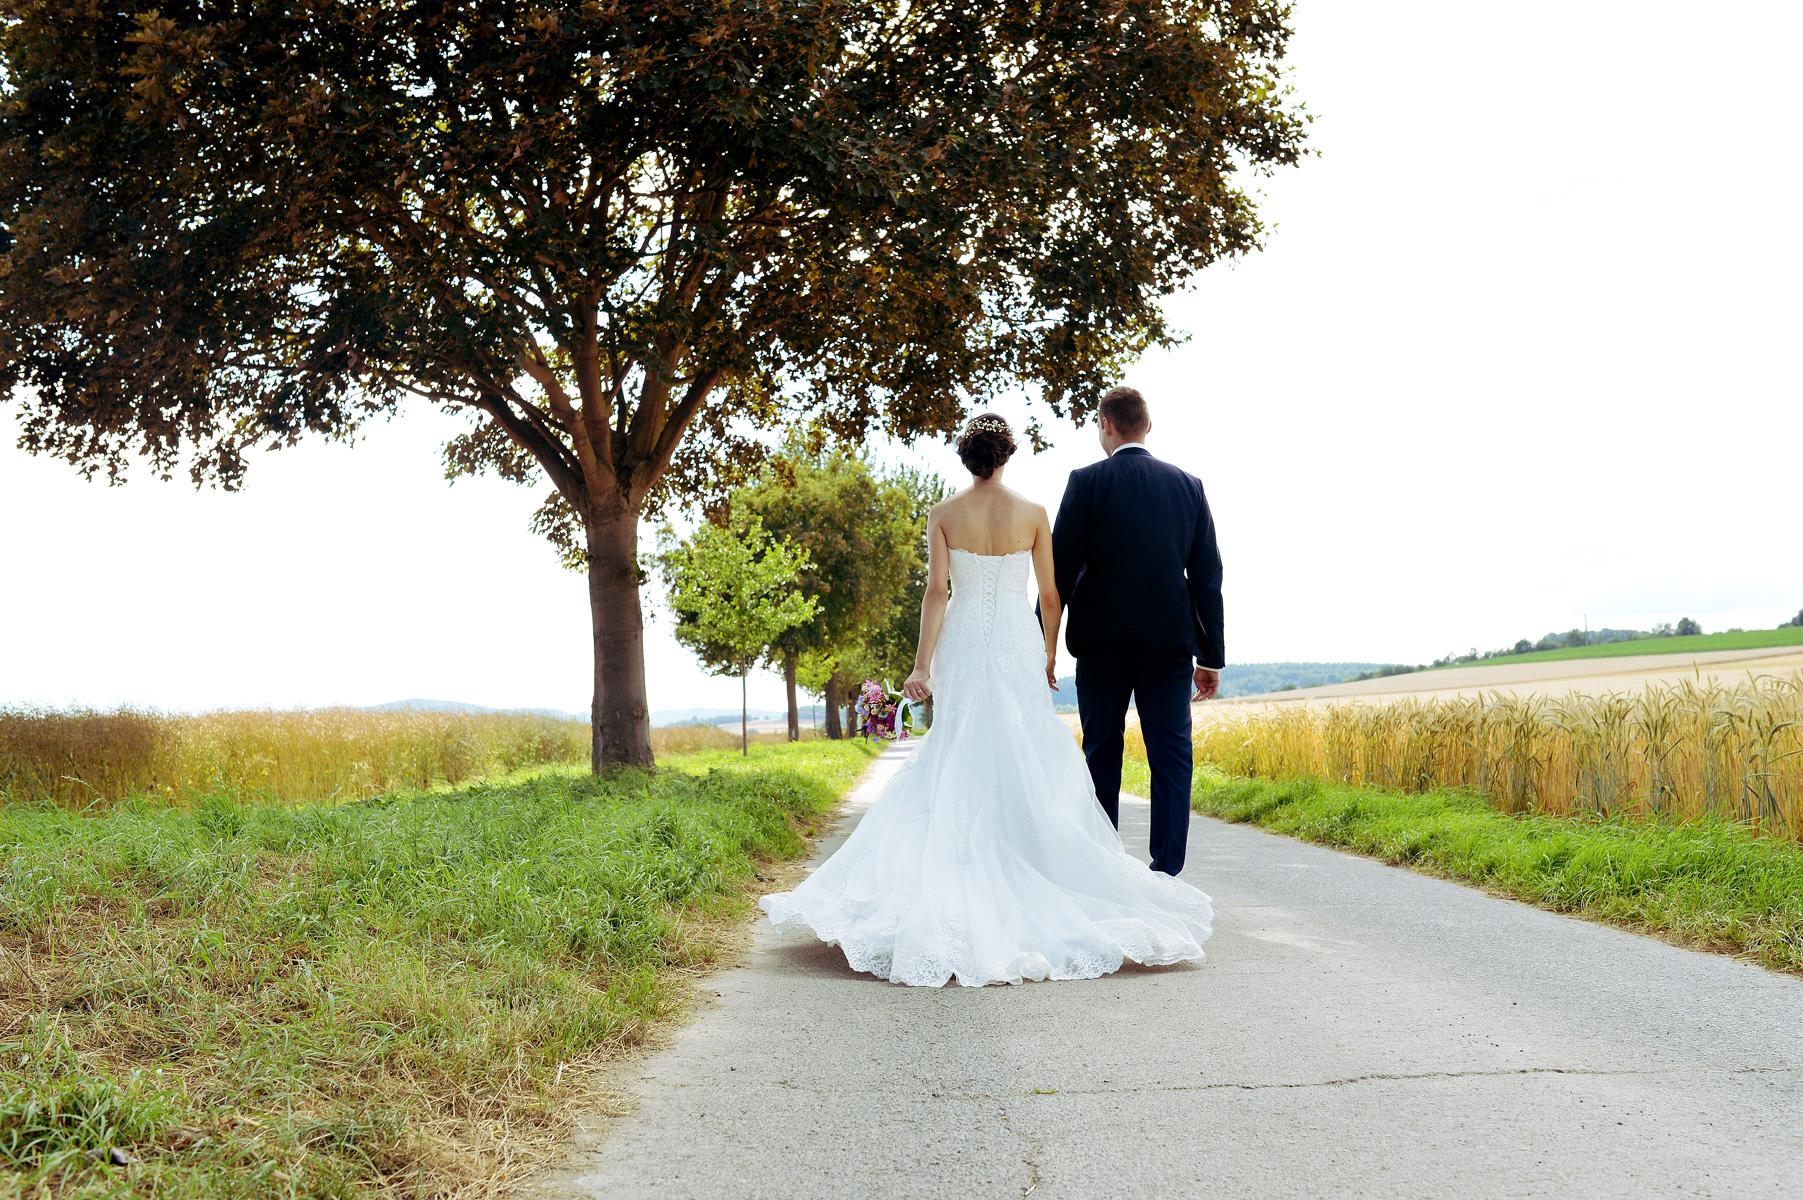 Hochzeitsfotos_nicole_bouillon_fotografie5